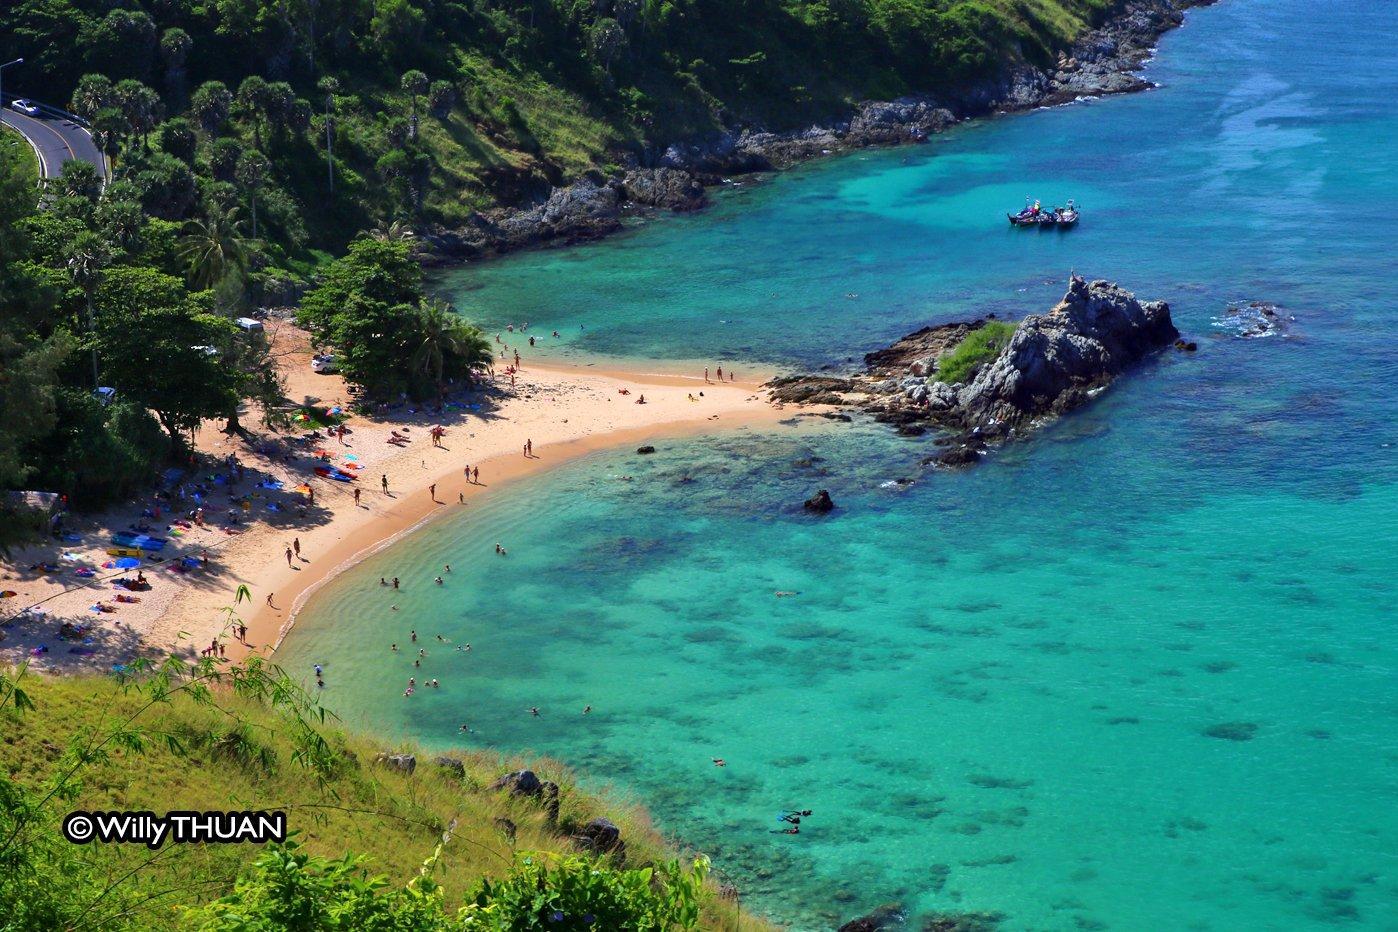 Best Beaches Phuket Or Koh Samui